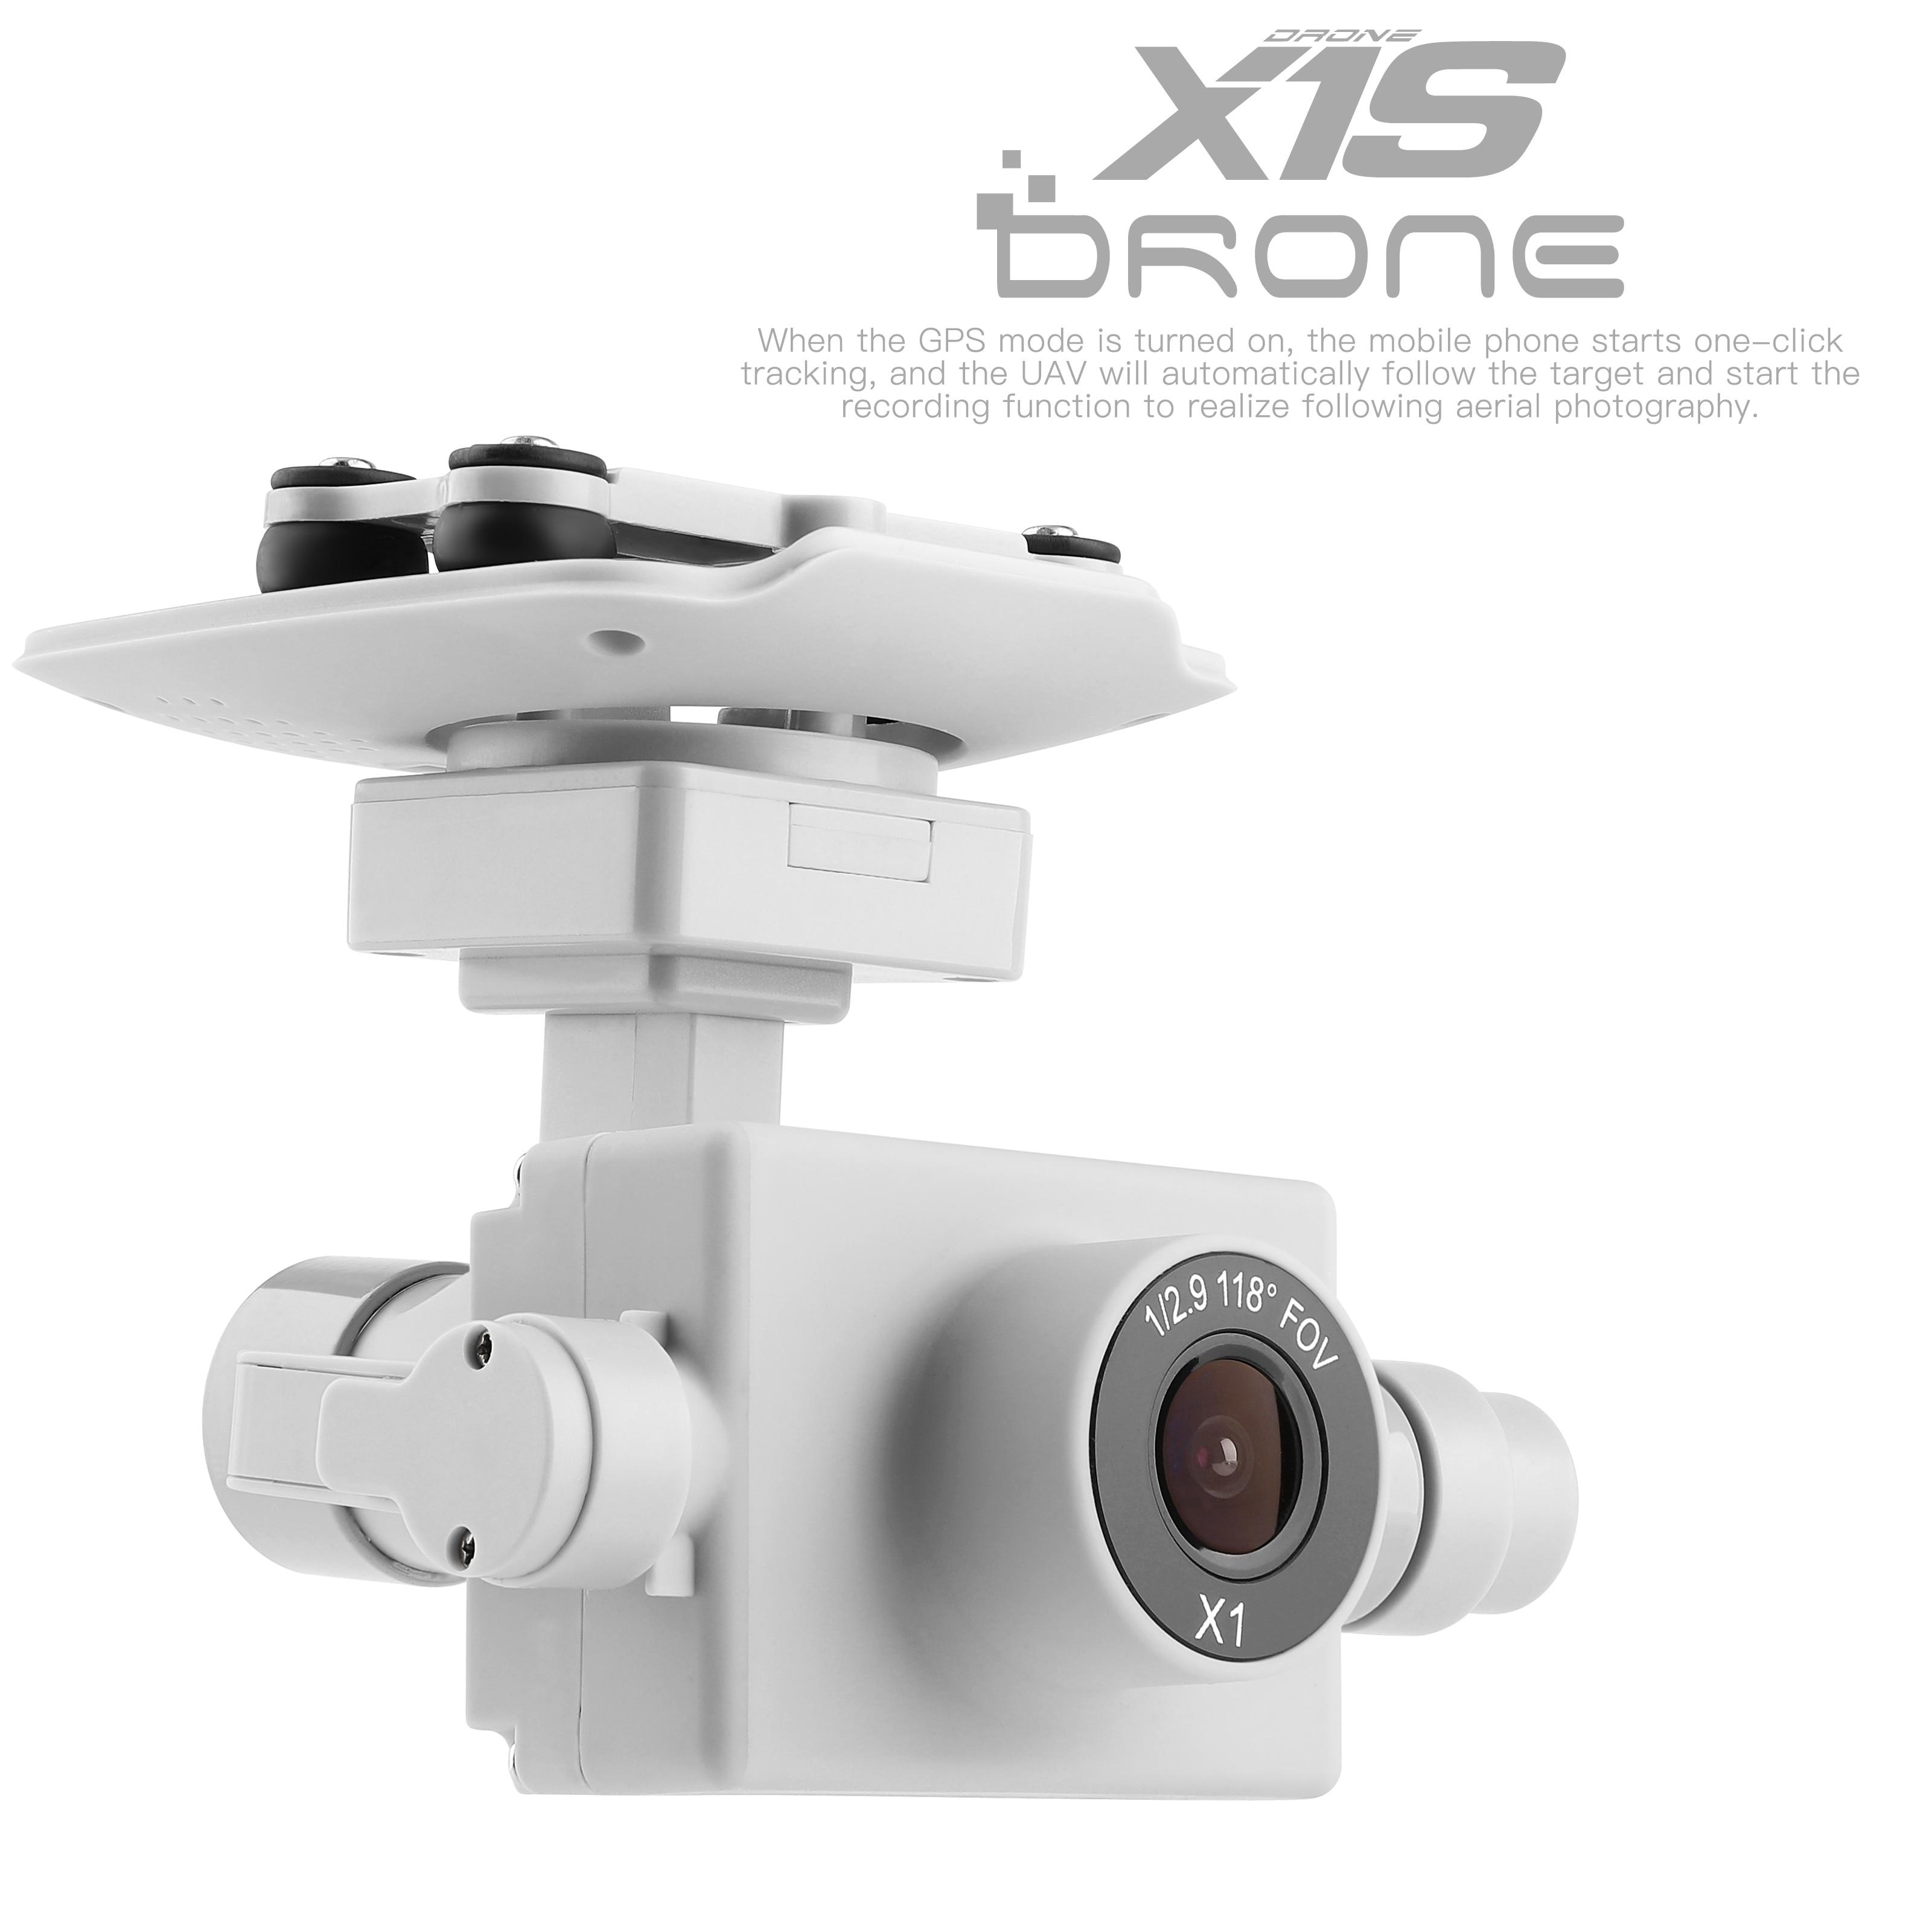 WLtoys XKS X1 RC Drone Original Spare Parts HD Camera X1S-0014 4K 5G WIFI Camera with Platform Gyro PTZ enlarge